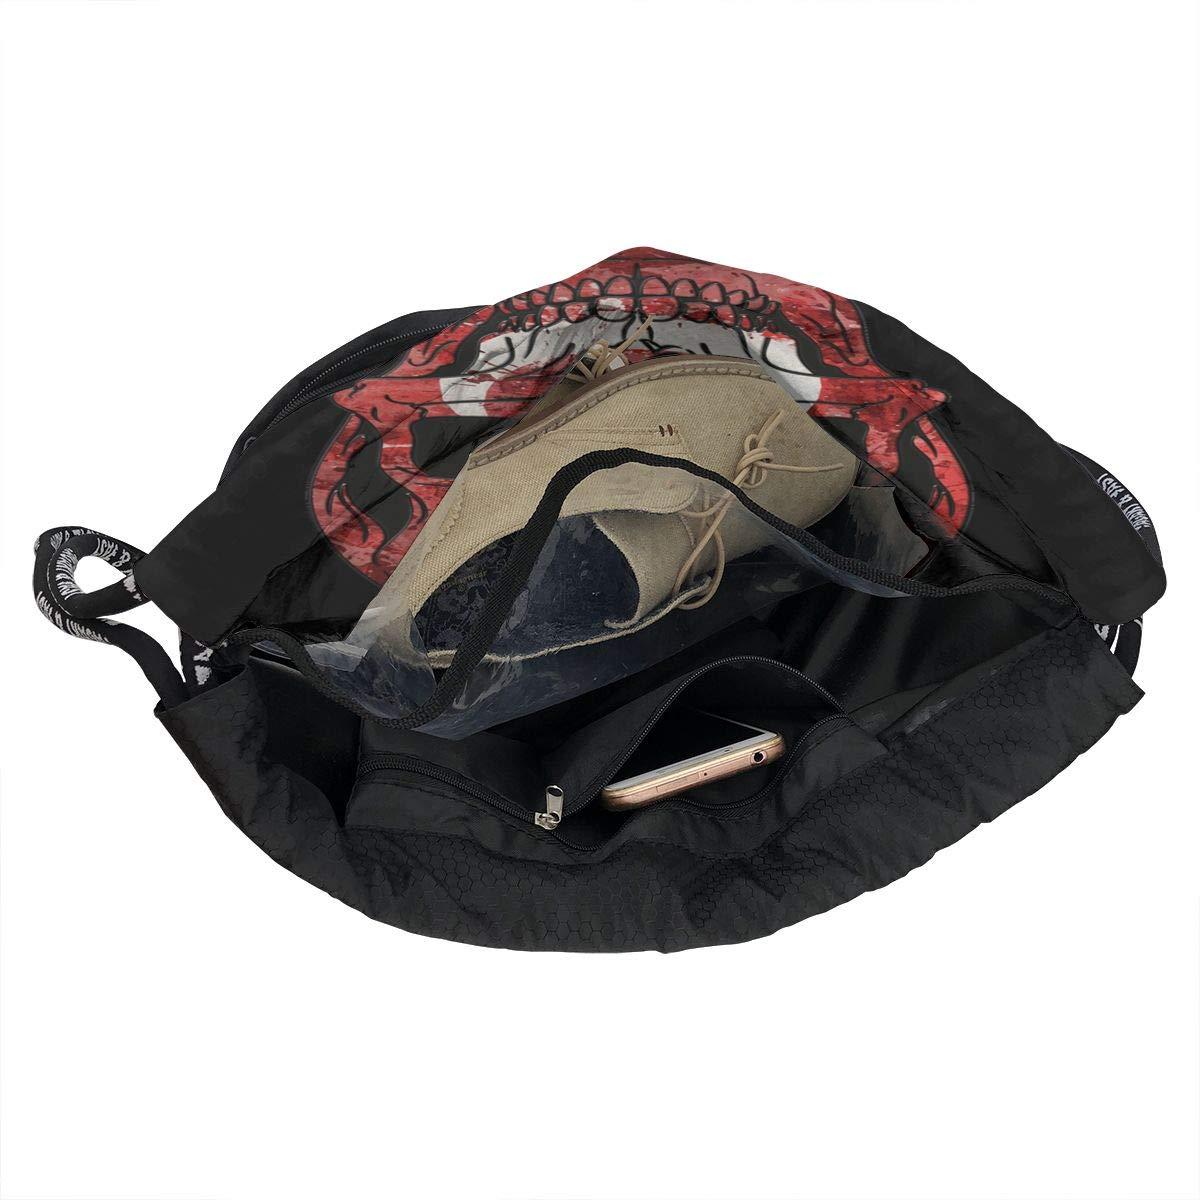 Turkish Skull Cinch Backpack Sackpack Tote Sack Zol1Q Lightweight Waterproof Large Storage Drawstring Bag for Men /& Women